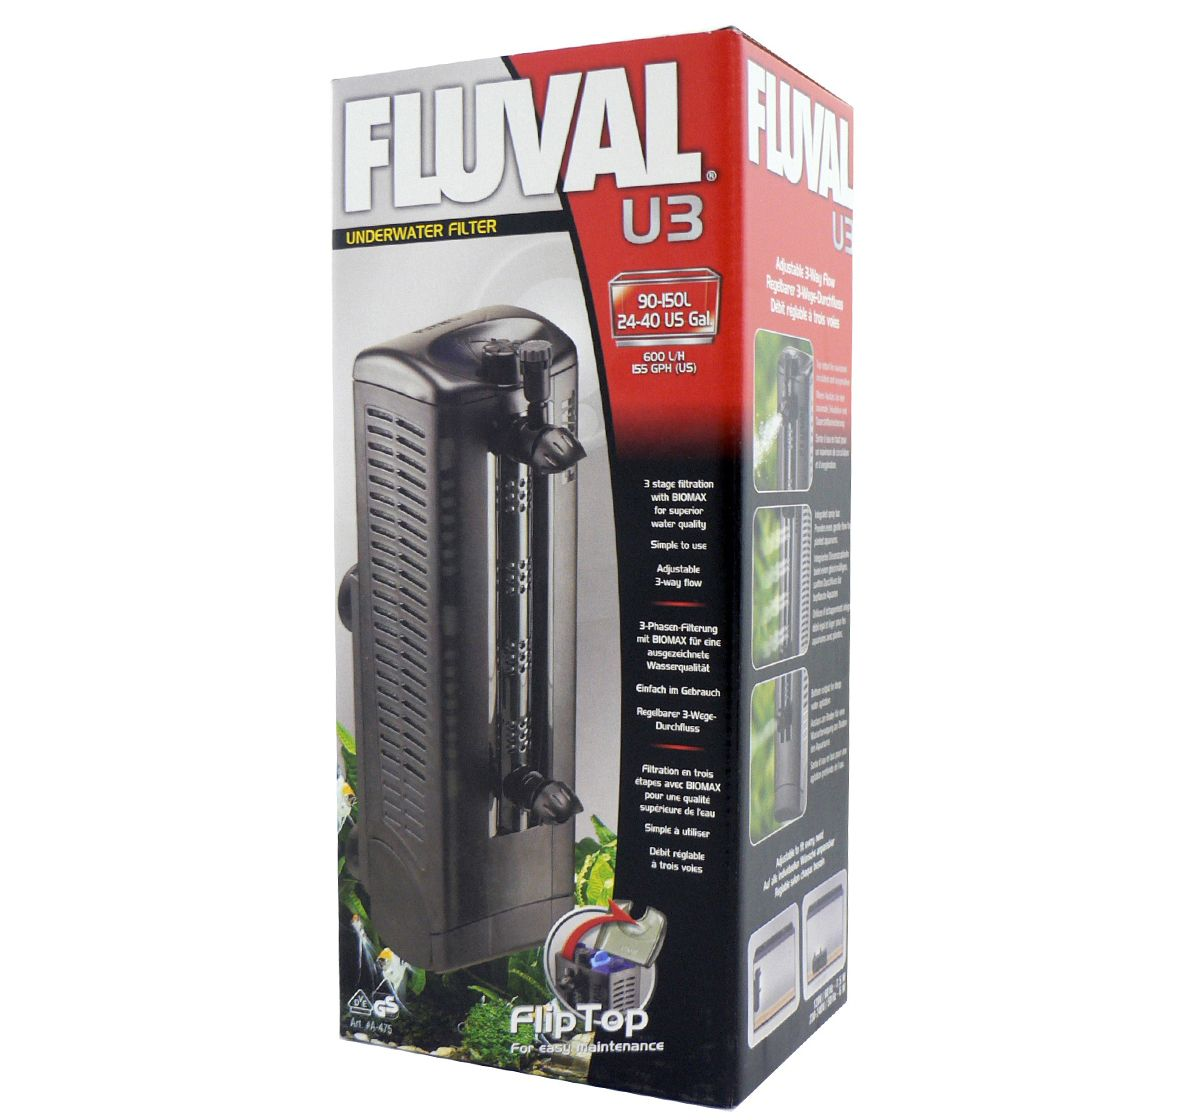 Fluval underwater filter u3 pay phone landline phone